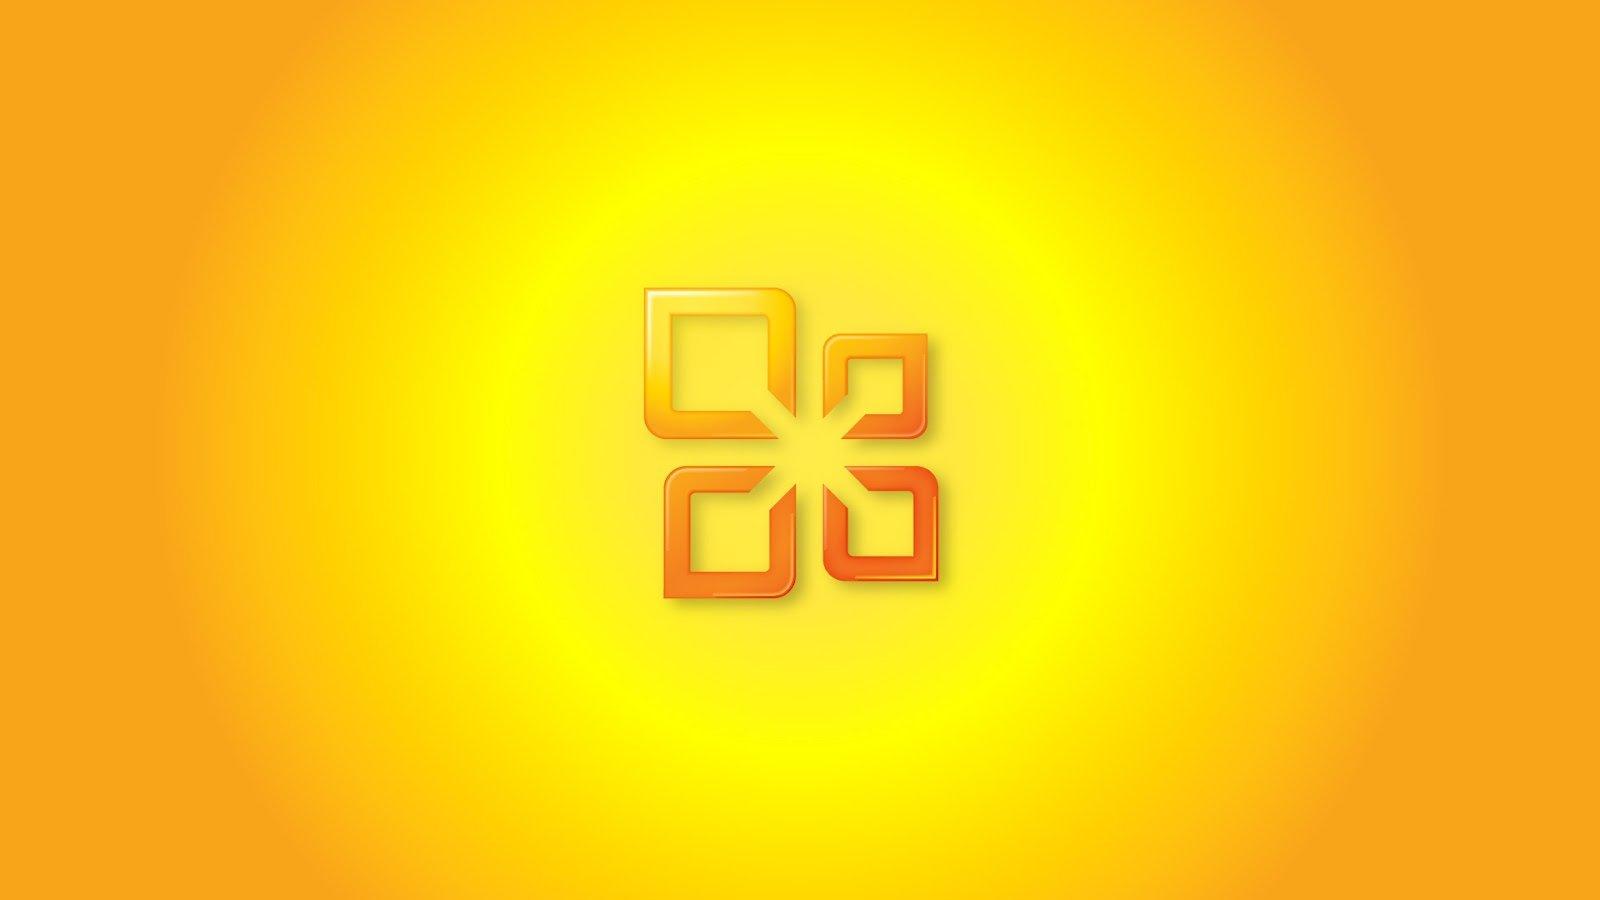 microsoft powerpoint logo wallpaper - photo #10